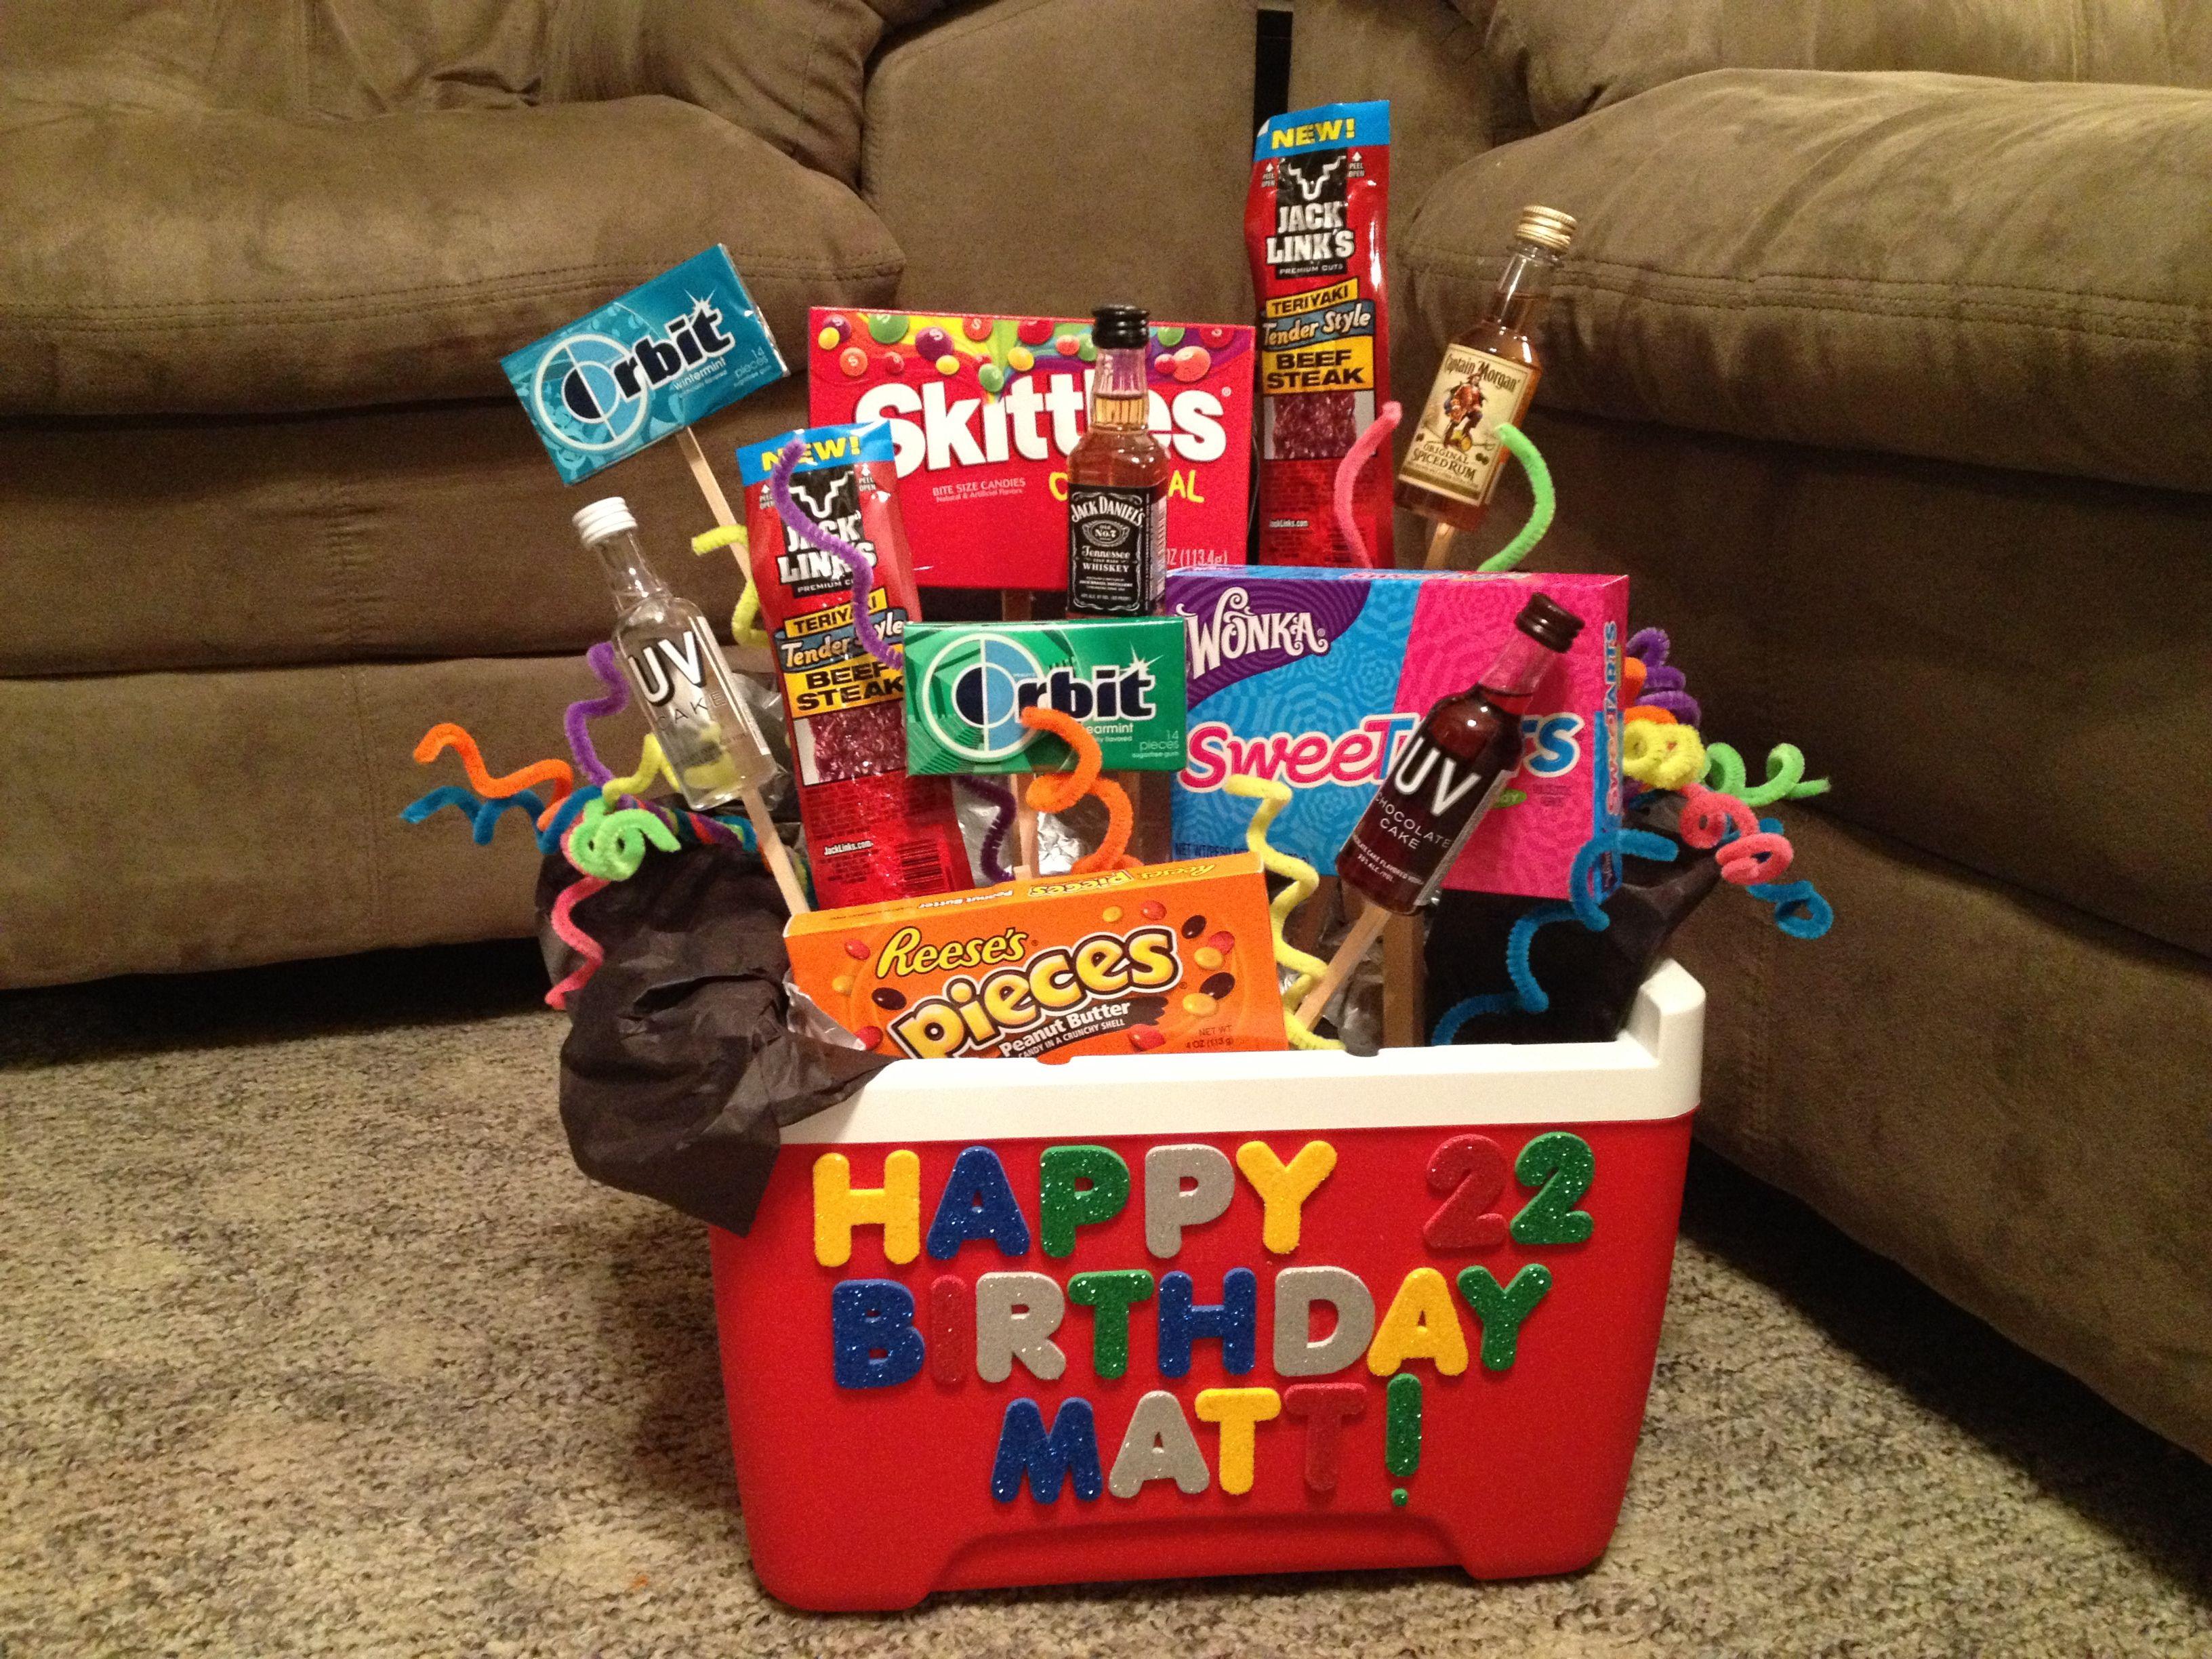 Birthday gift for your boyfriend. g i f t s f o r h i m